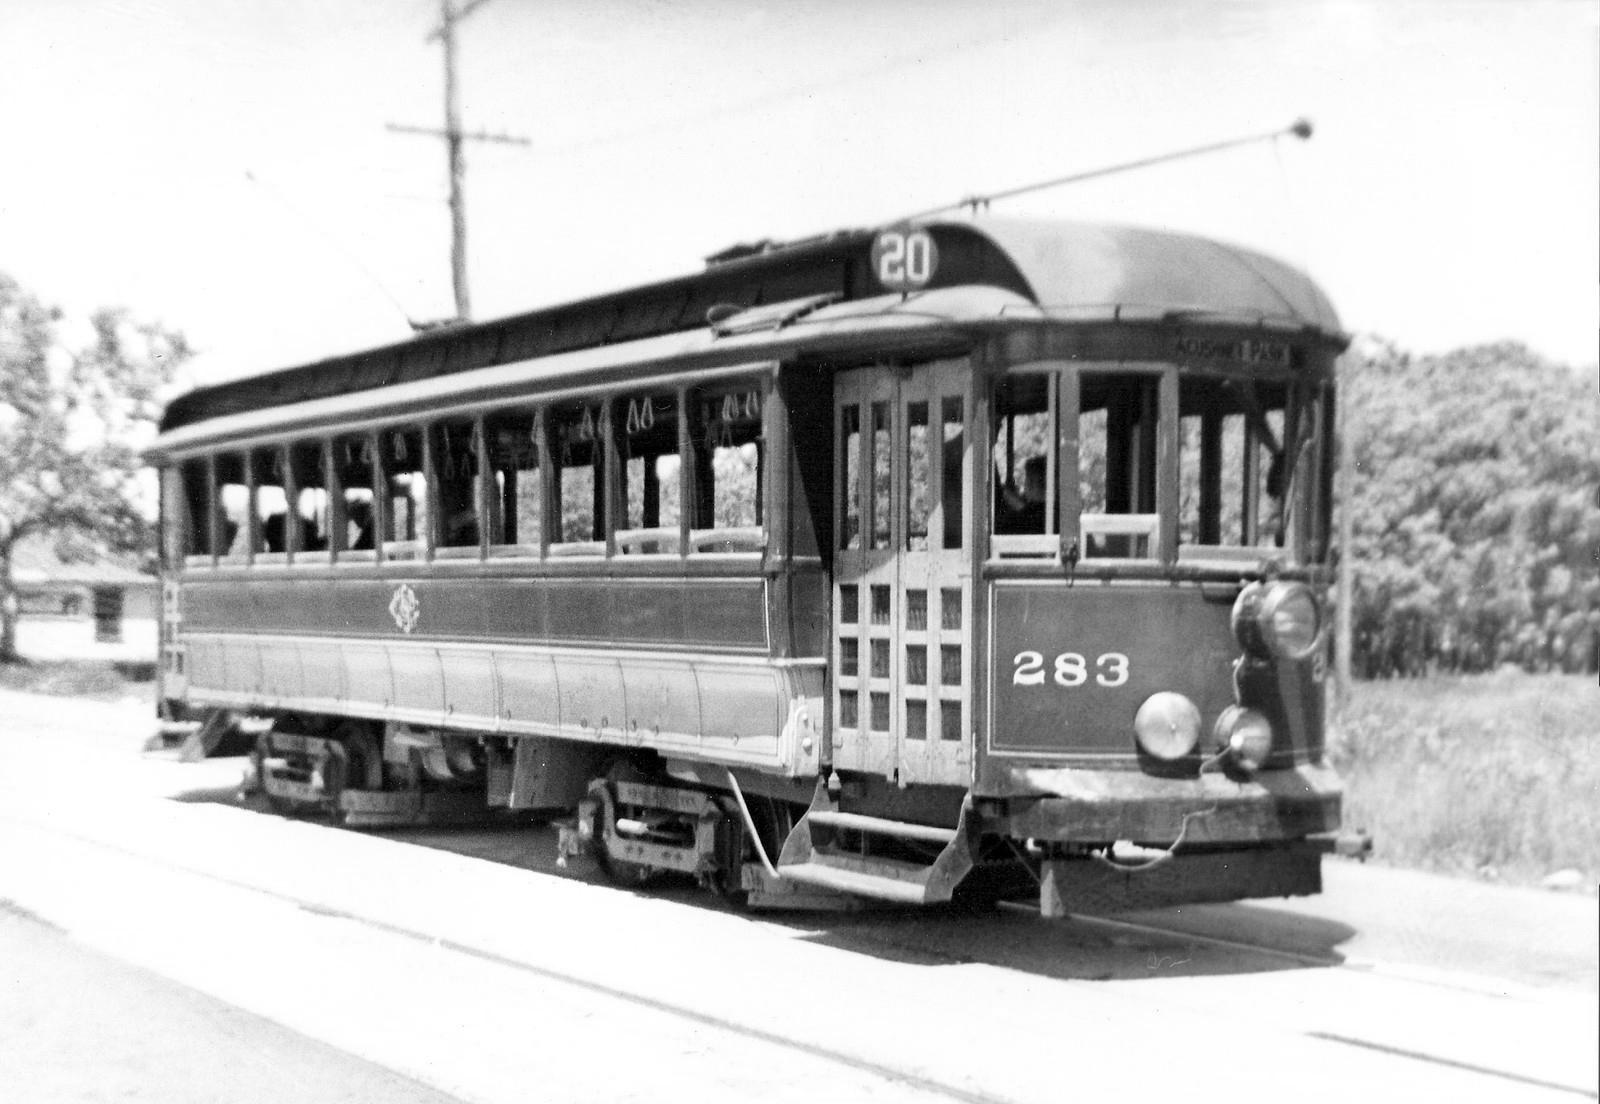 Trolley Car: Transpress Nz: Trolleys In New Bedford, Massachusetts